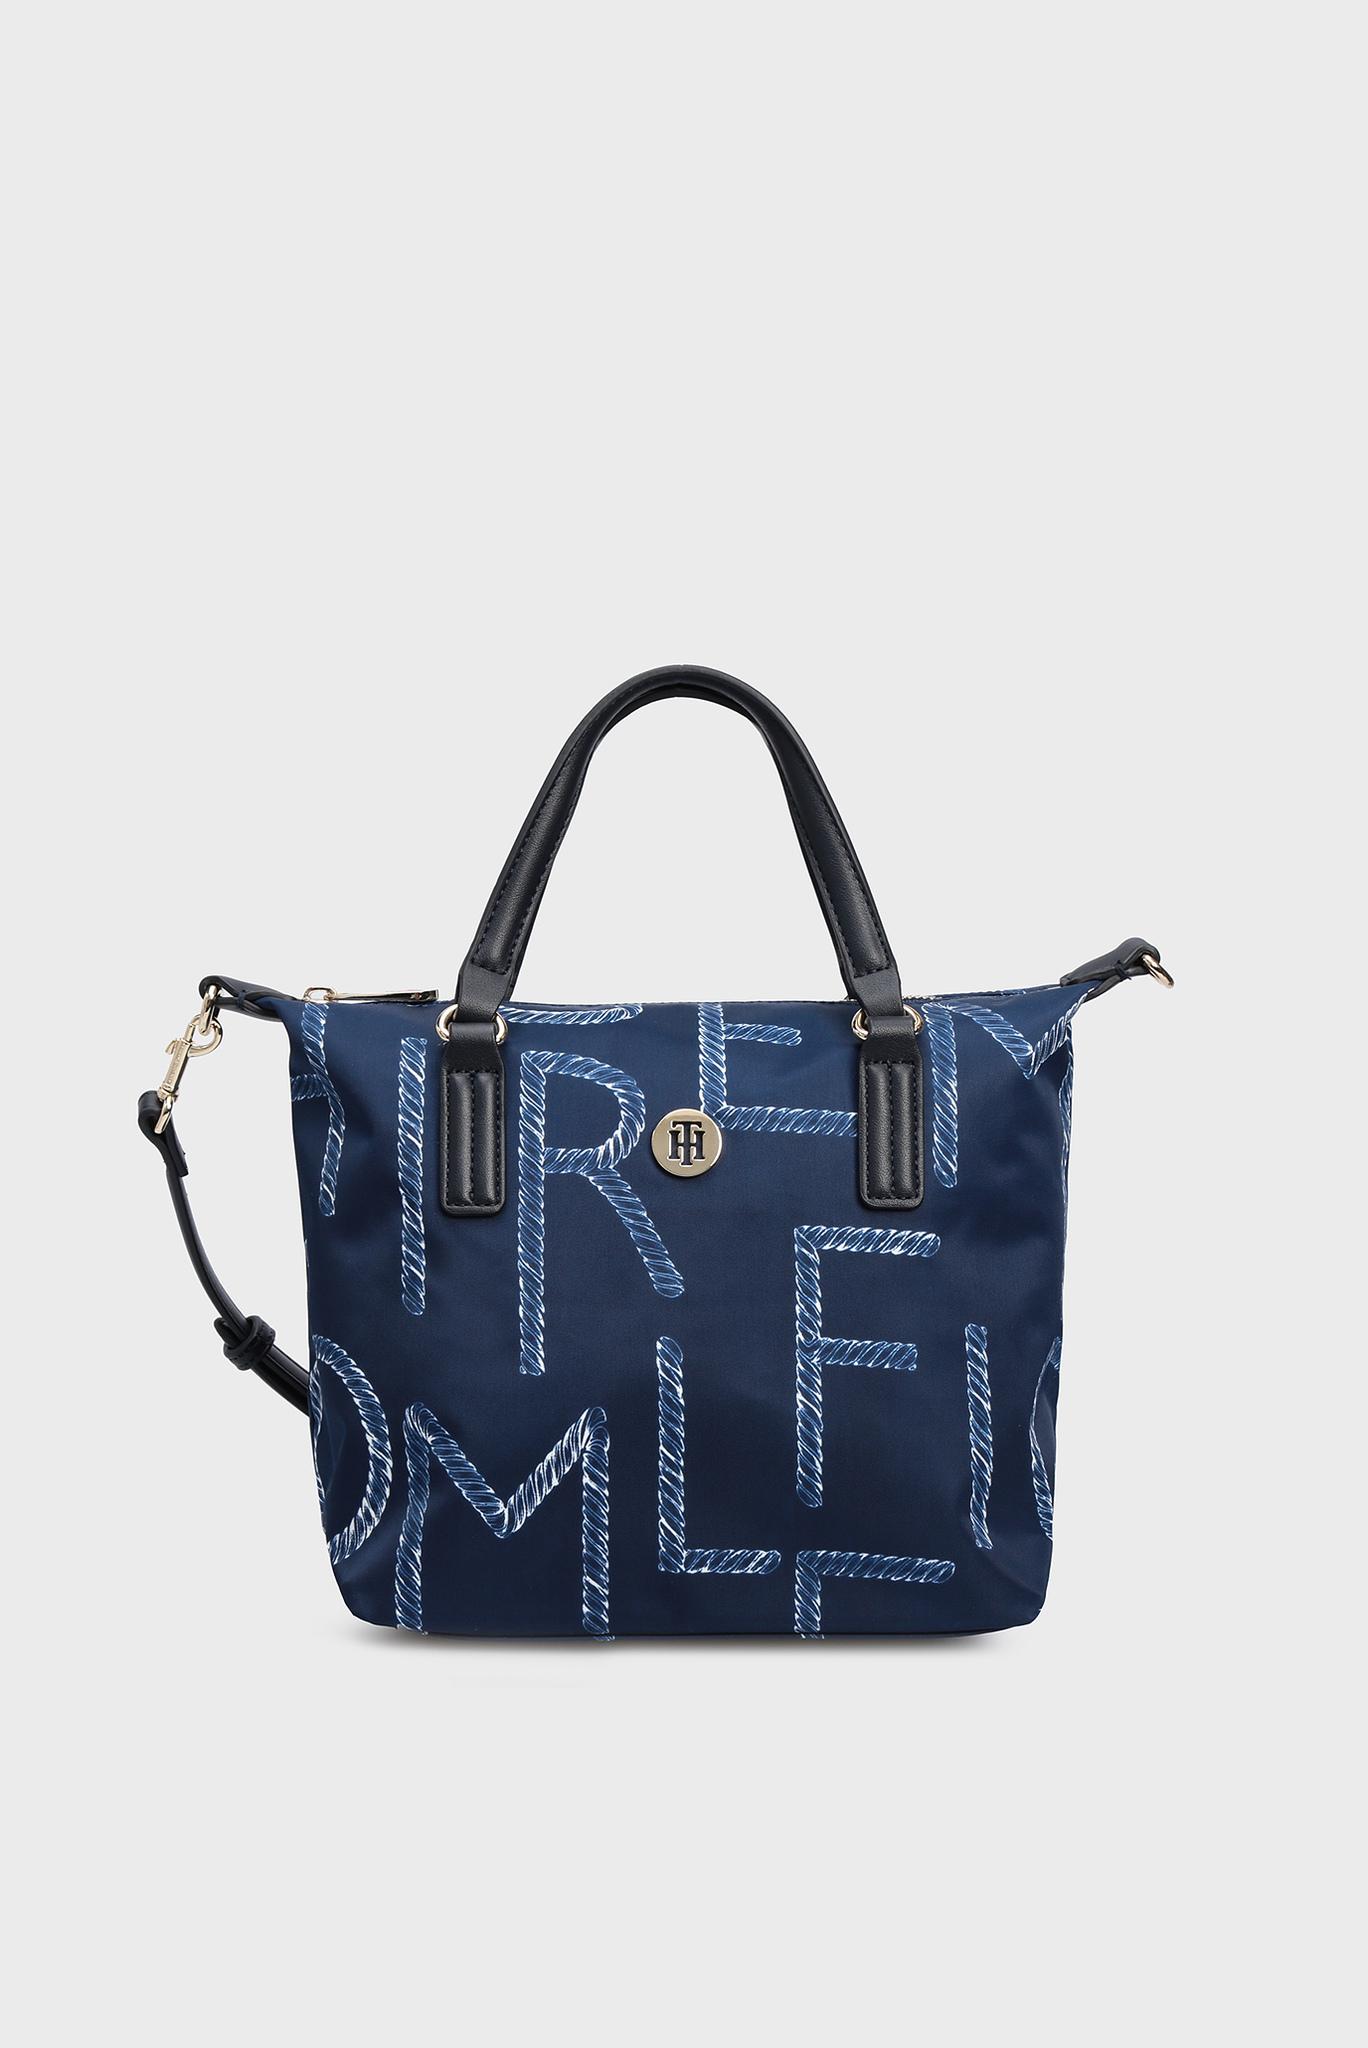 Женская синяя сумка через плечо POPPY SMALL TOTE ROPE Tommy Hilfiger